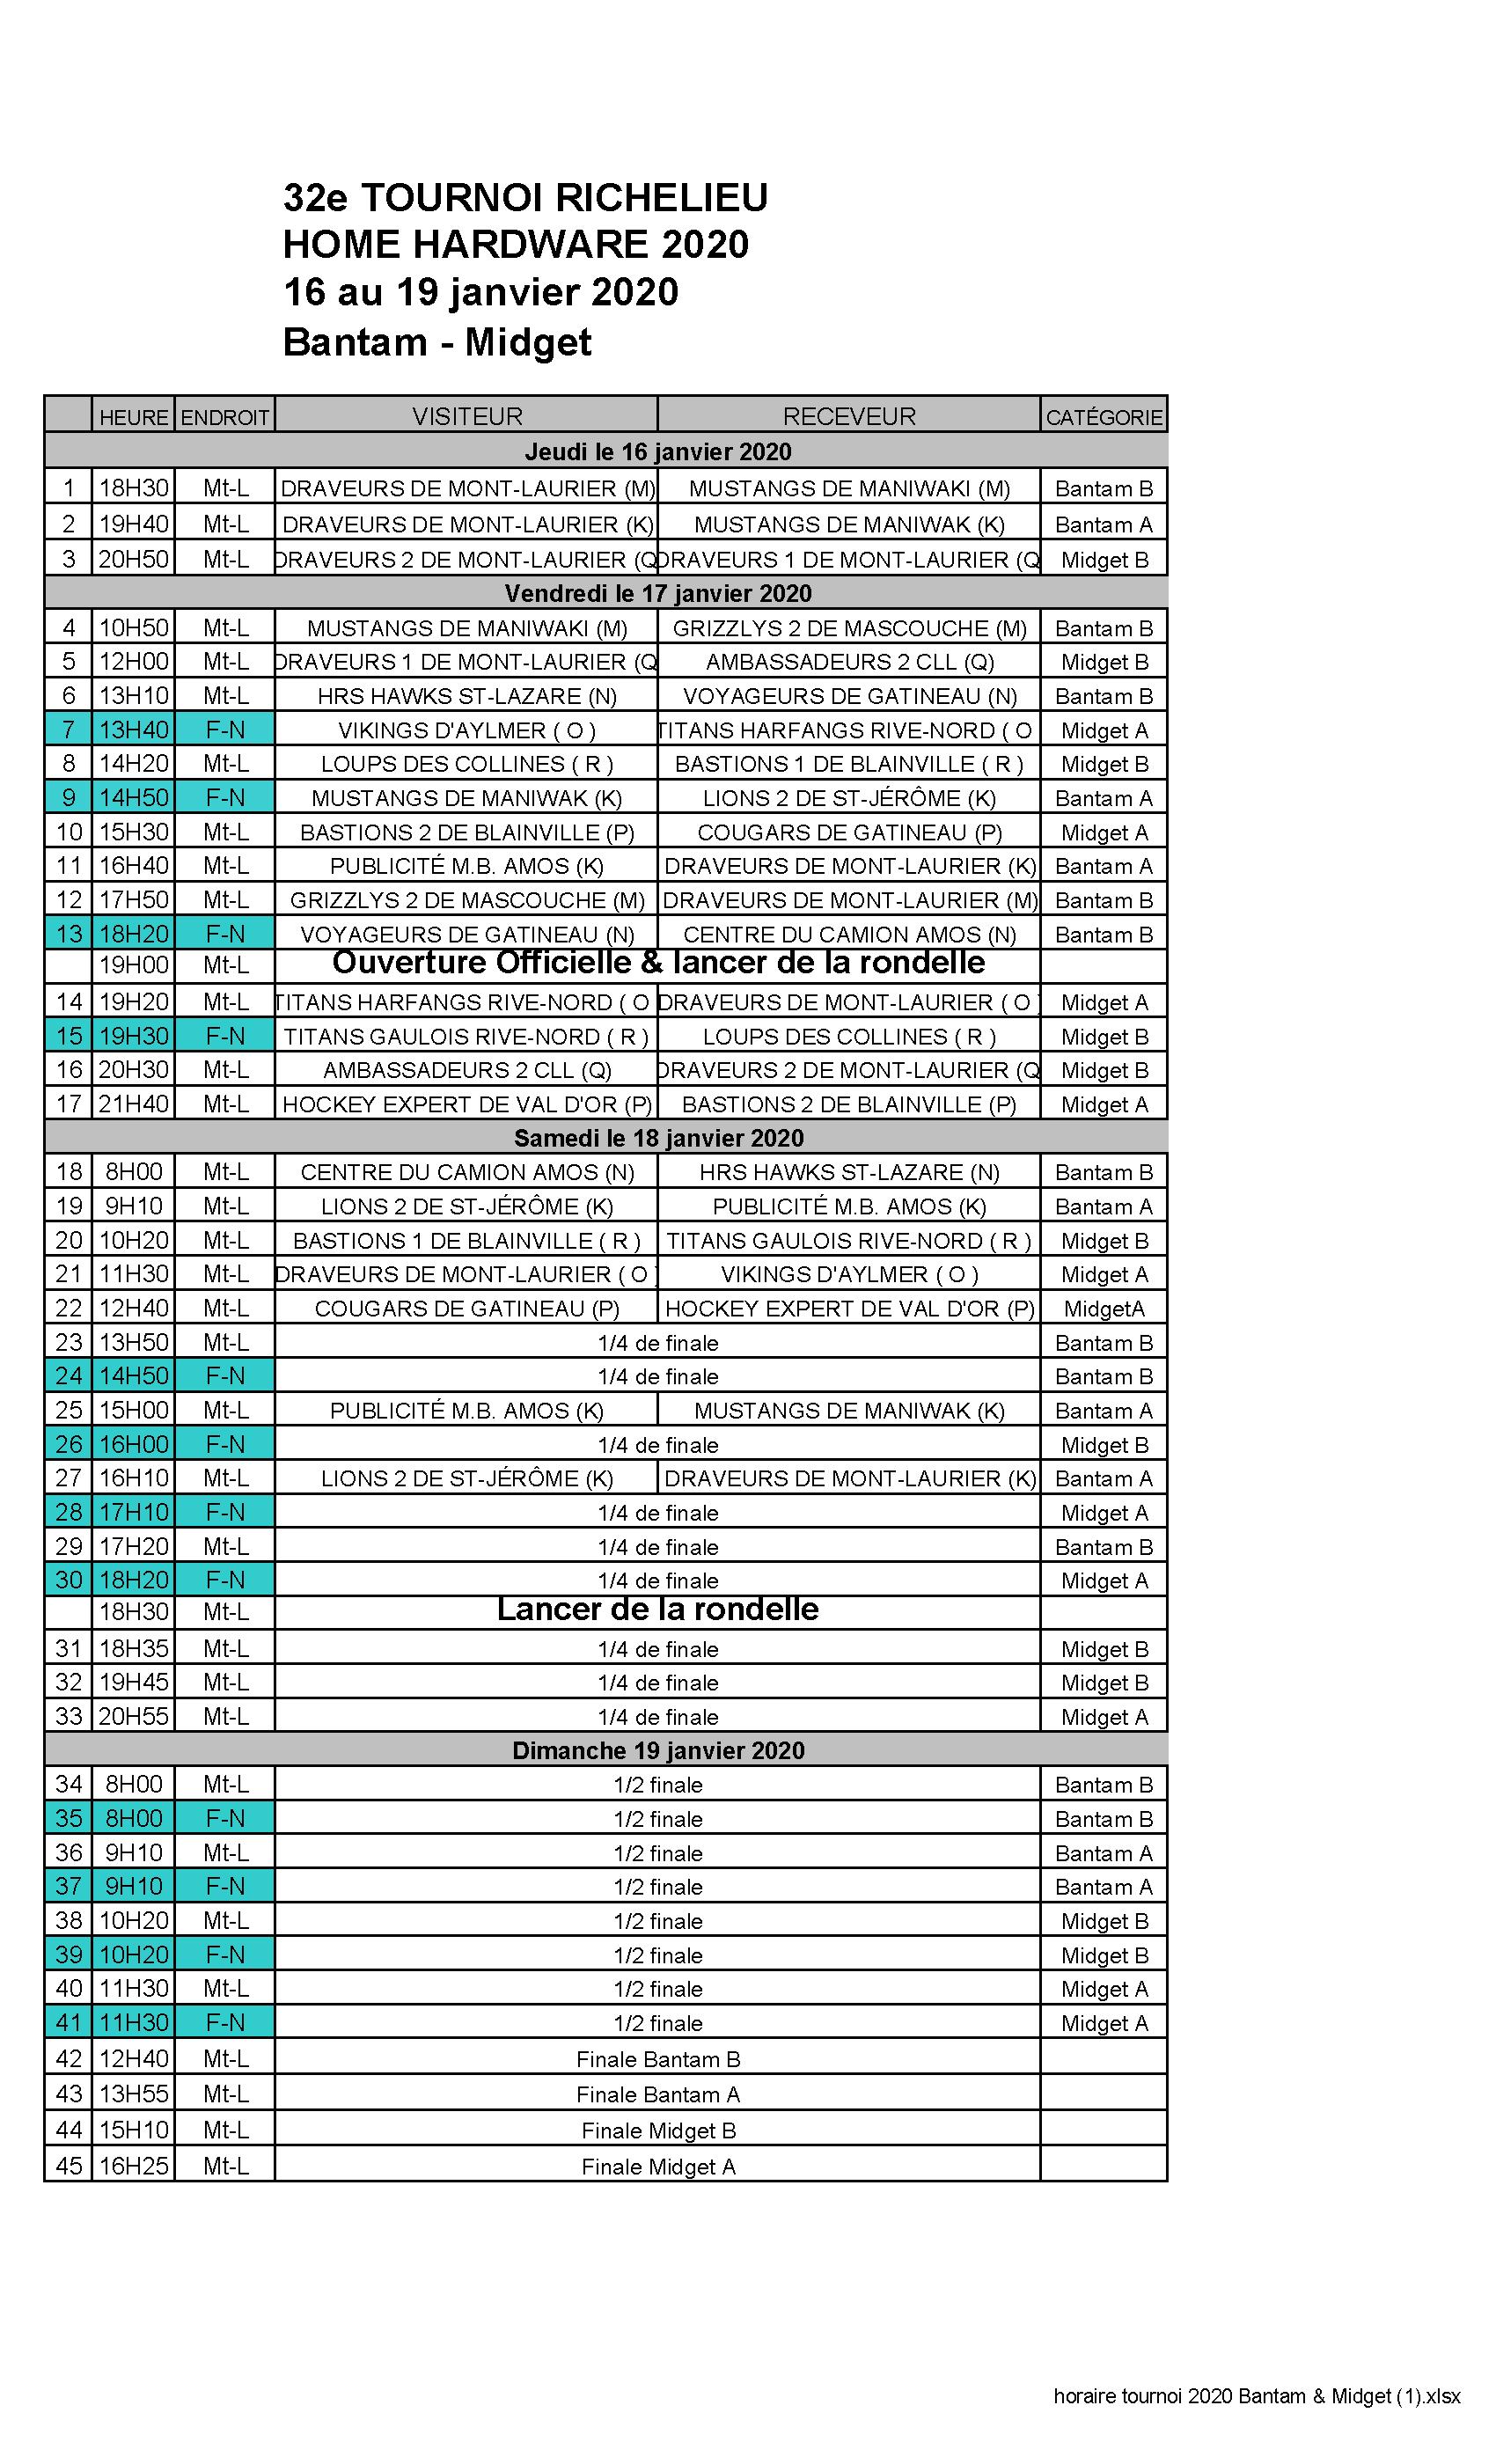 horaire tournoi 2020 Bantam & Midget (1).png